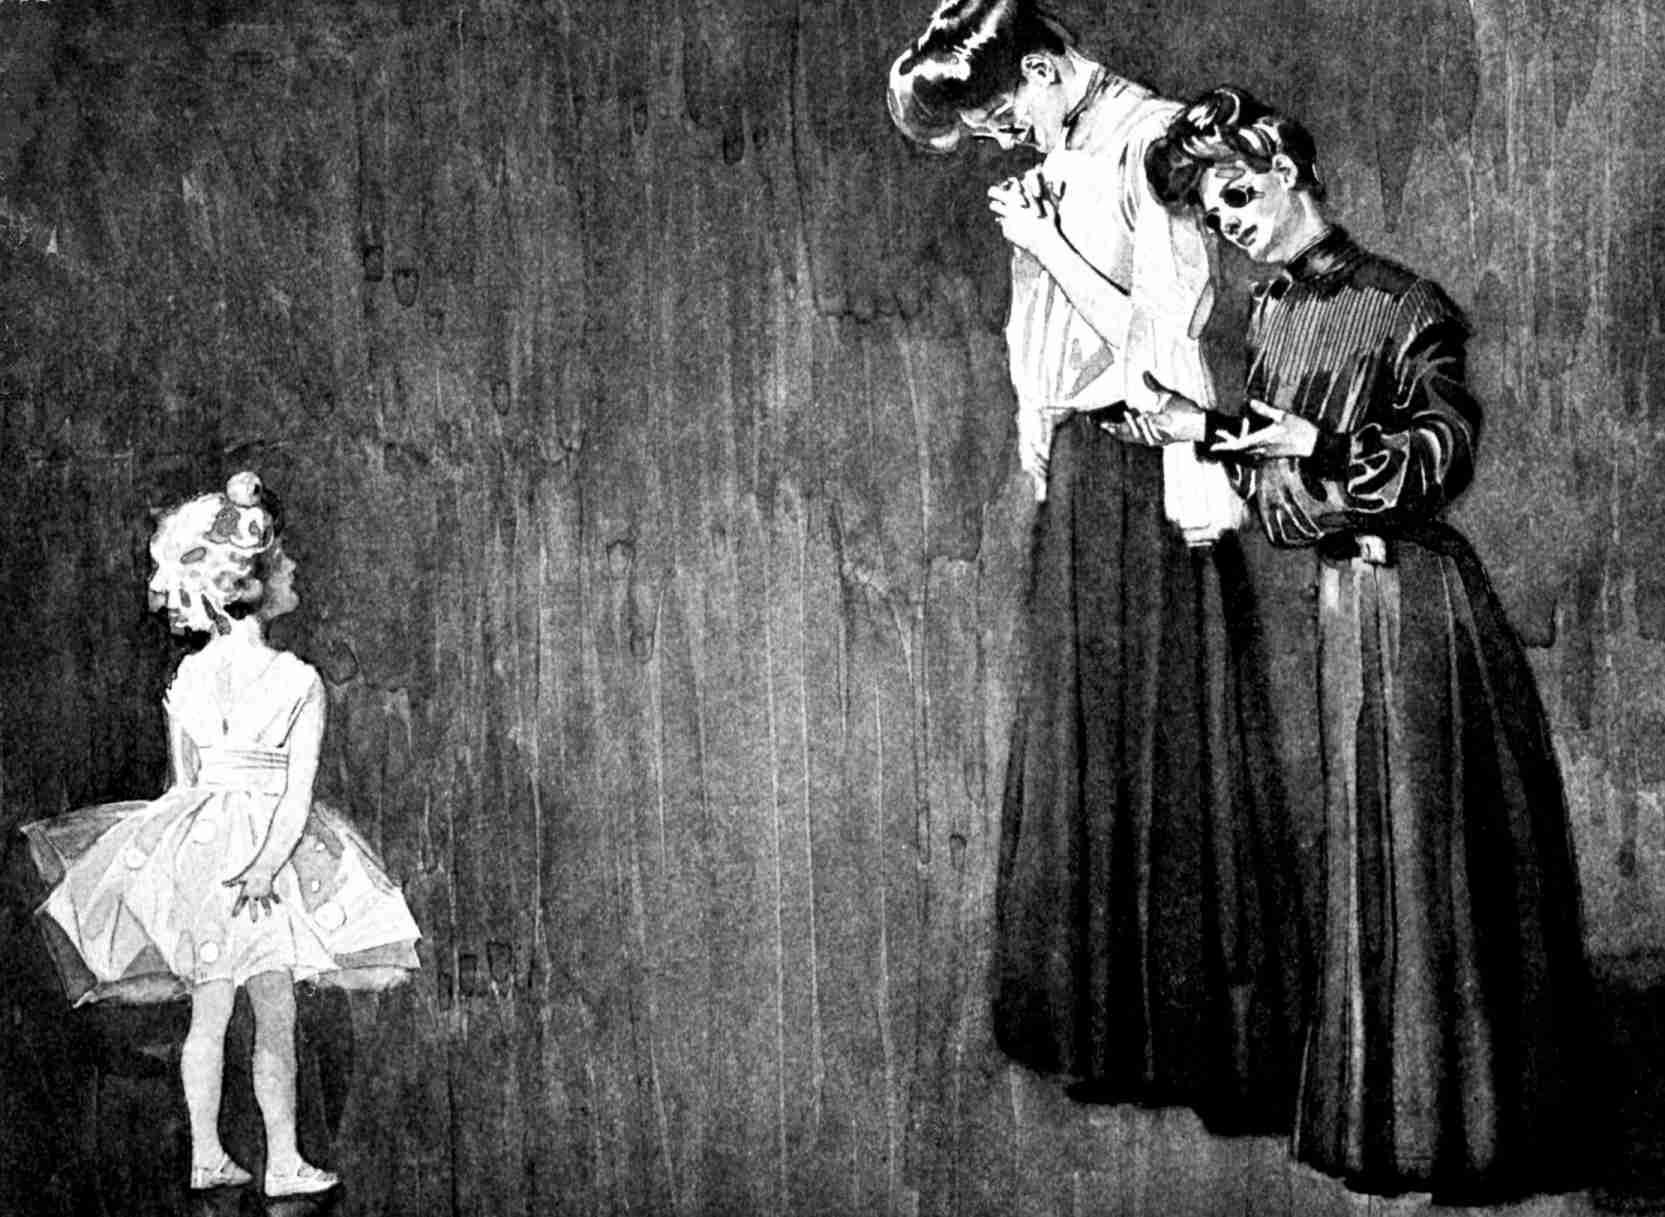 Boy/'s Ecko Black /& White Tuxedo Dress Shoes Spats Retro Vintage Costume Damaged